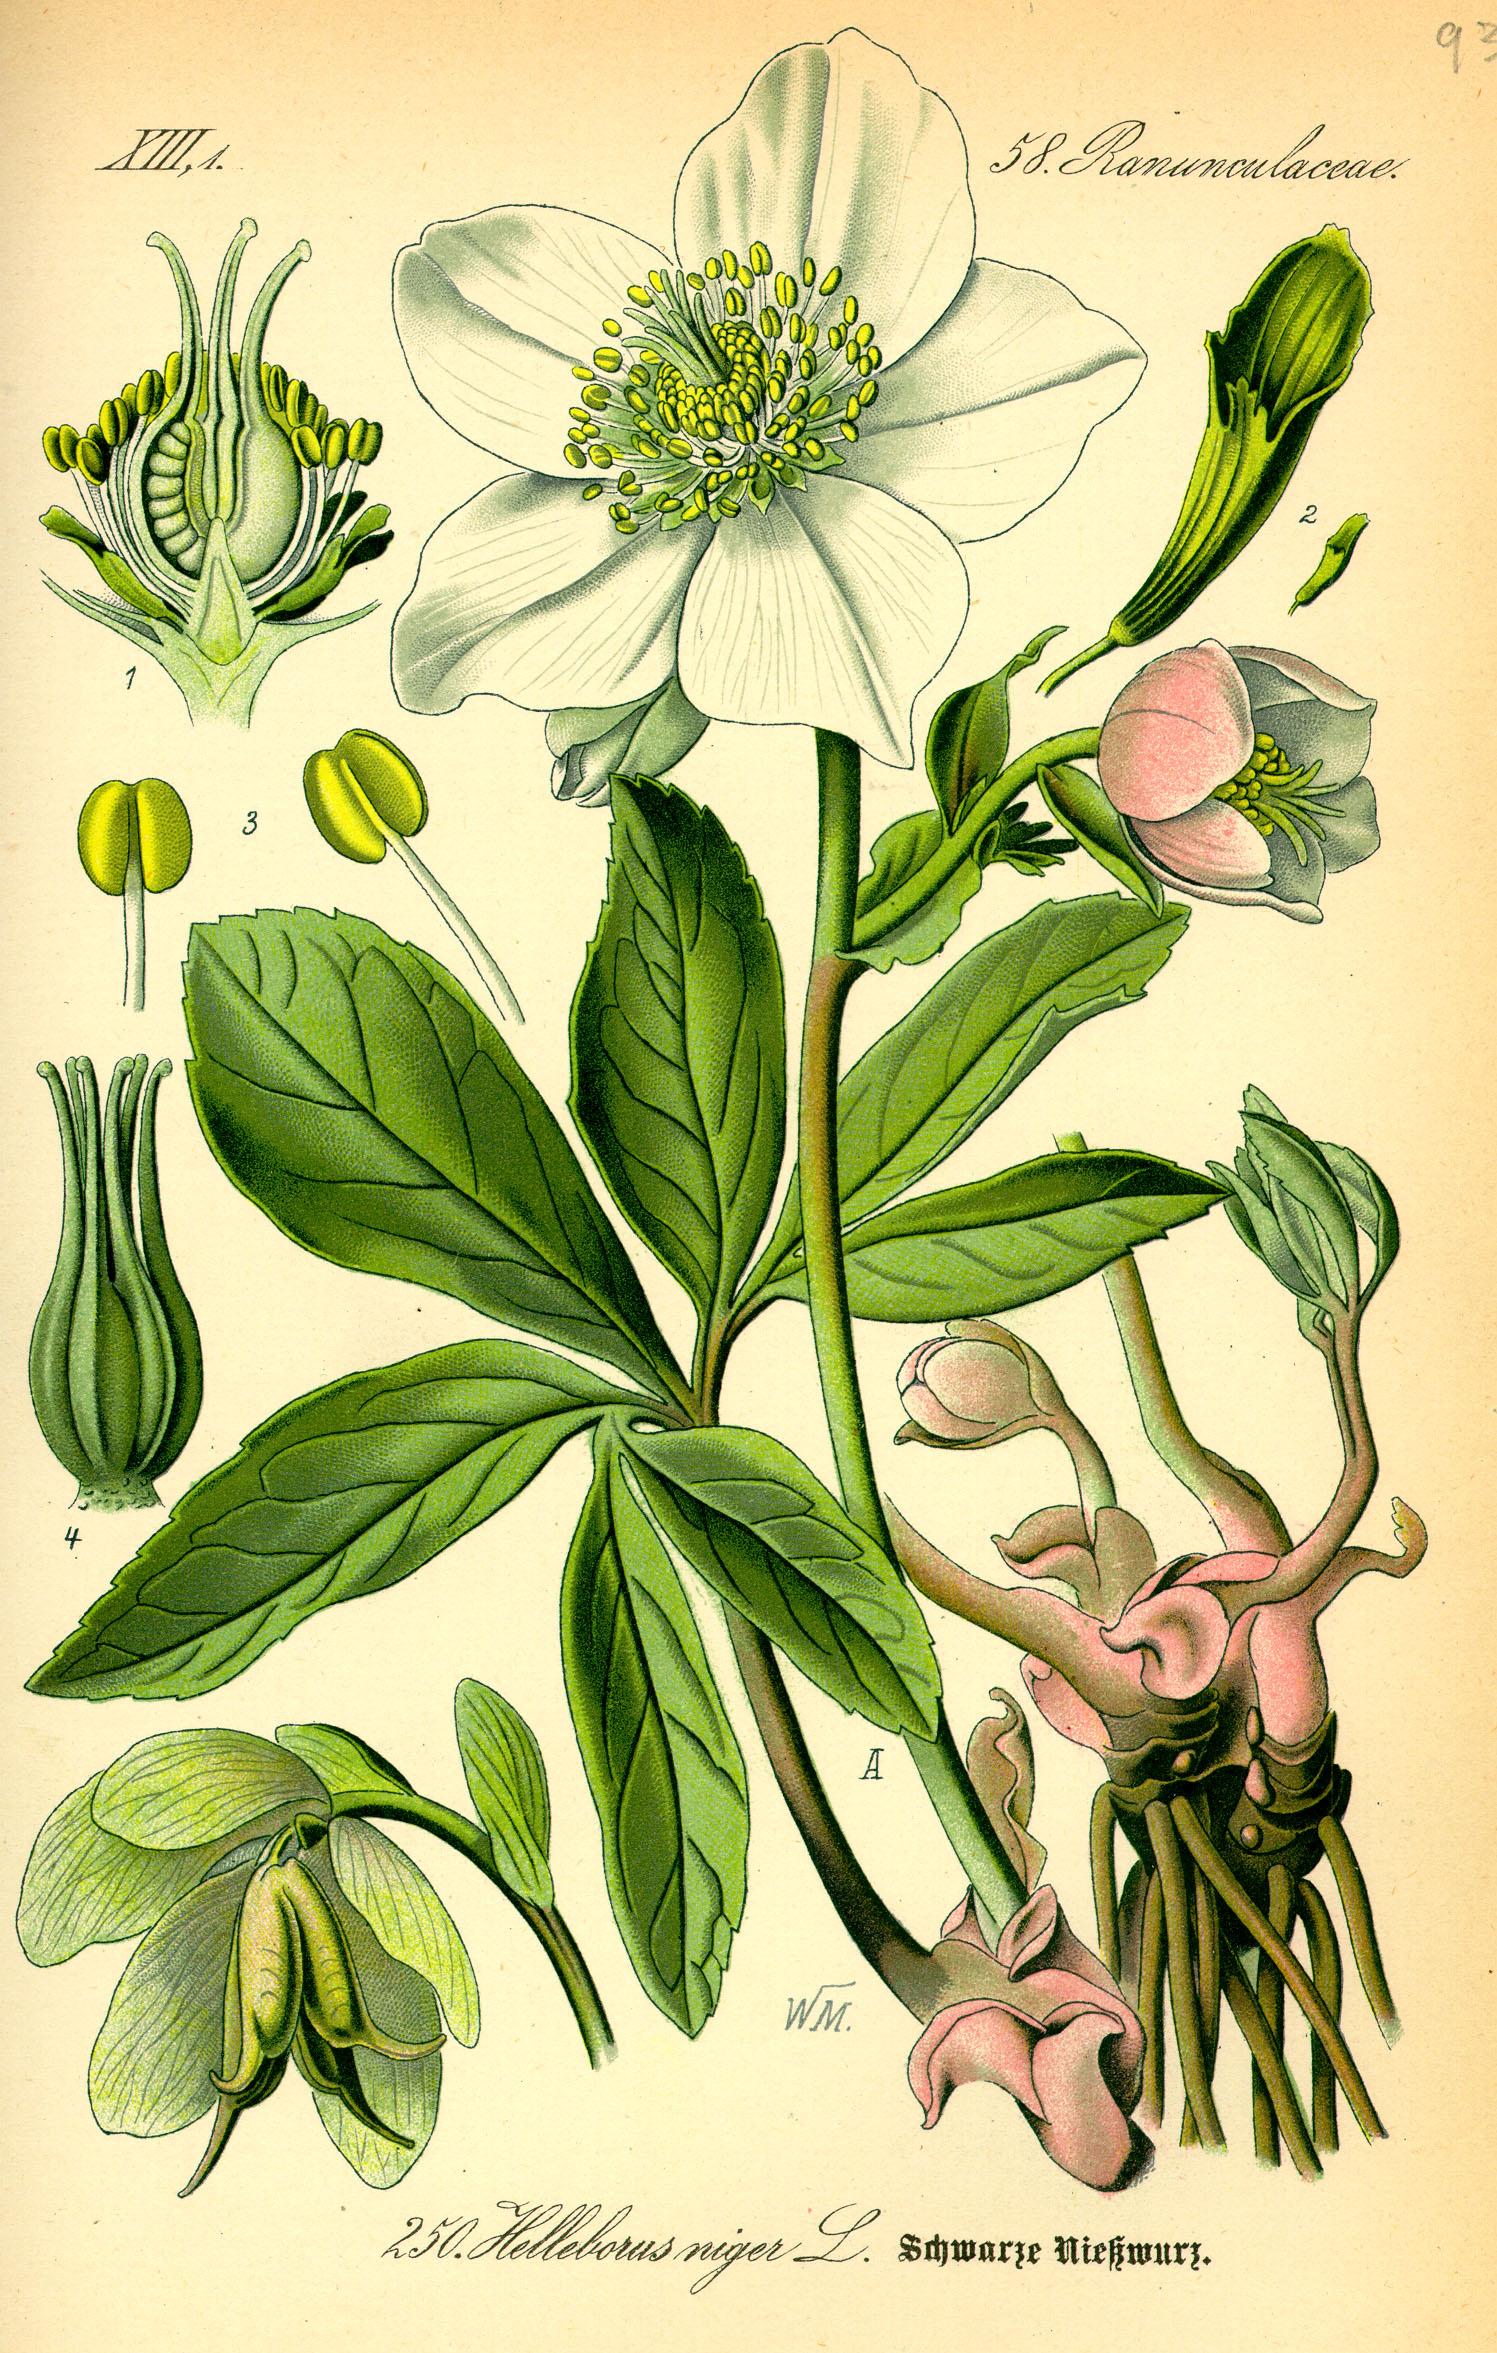 https://i2.wp.com/upload.wikimedia.org/wikipedia/commons/b/b0/Illustration_Helleborus_niger0.jpg